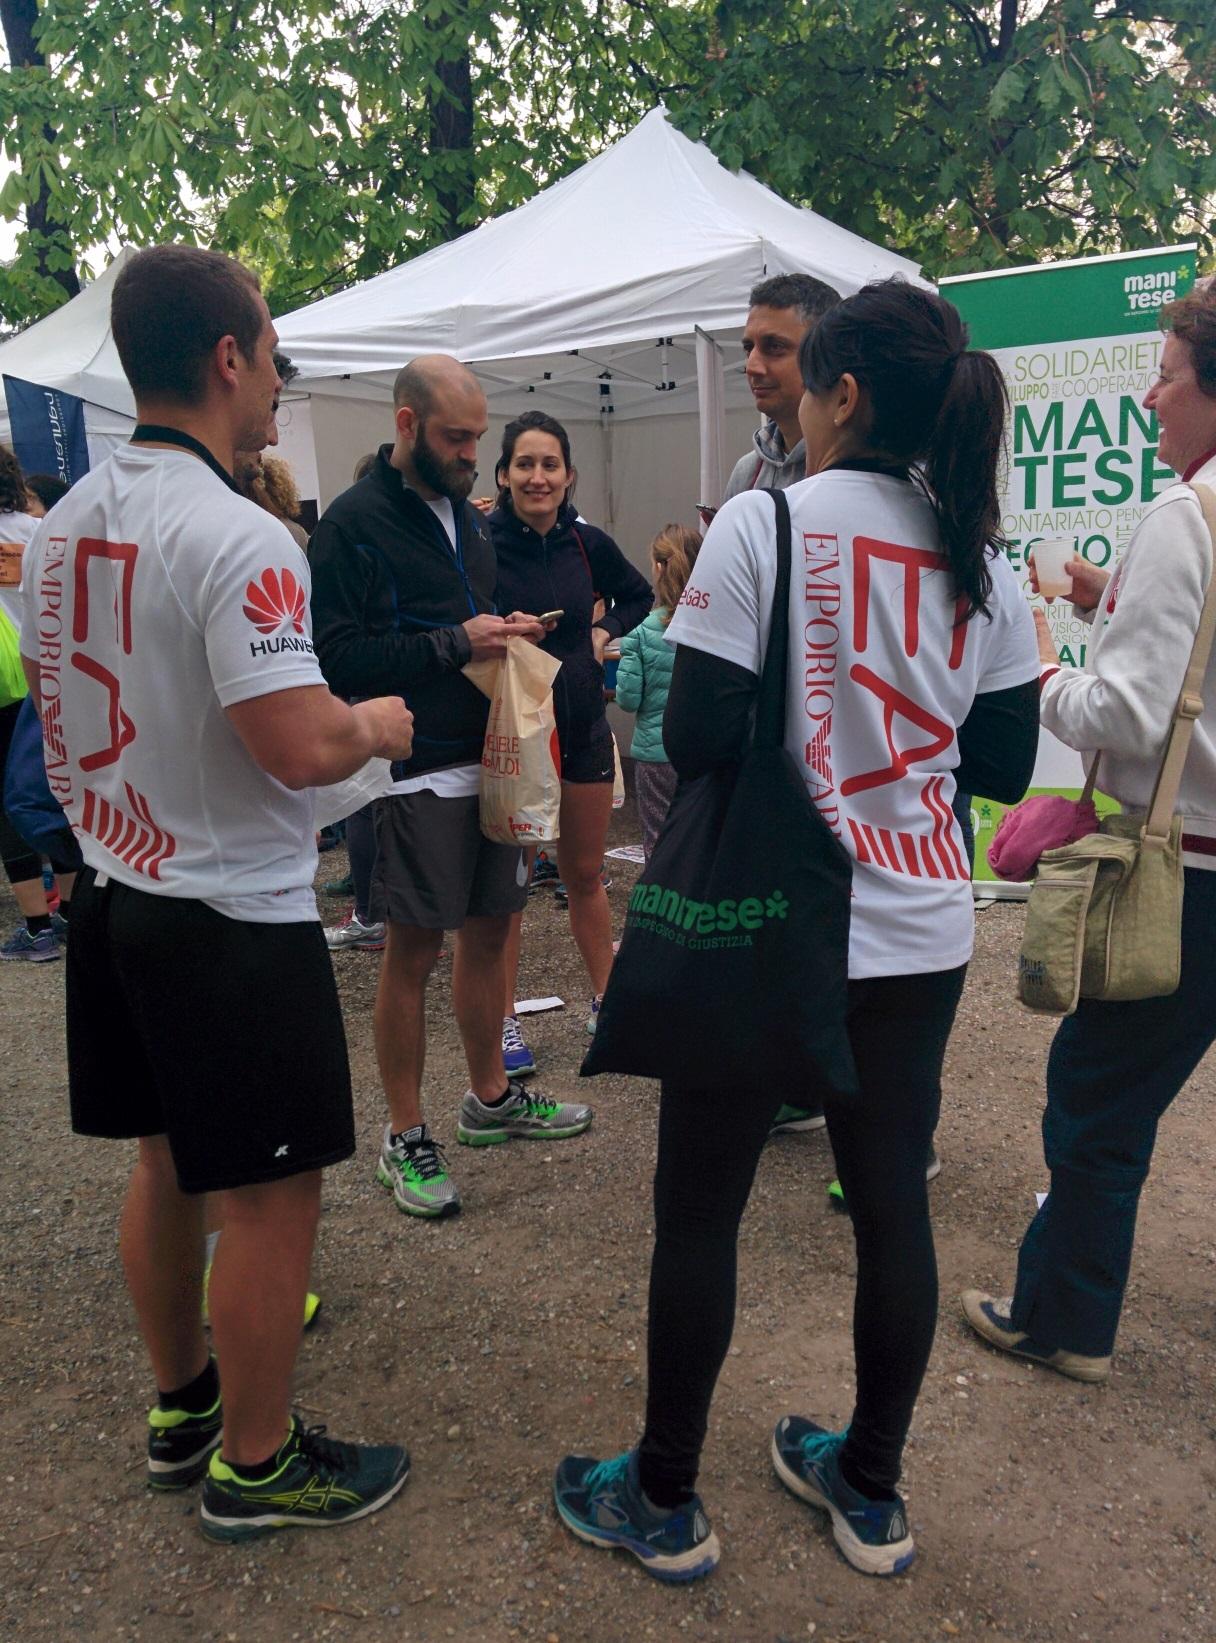 Milano_Marathon_8_Mani_Tese_2017